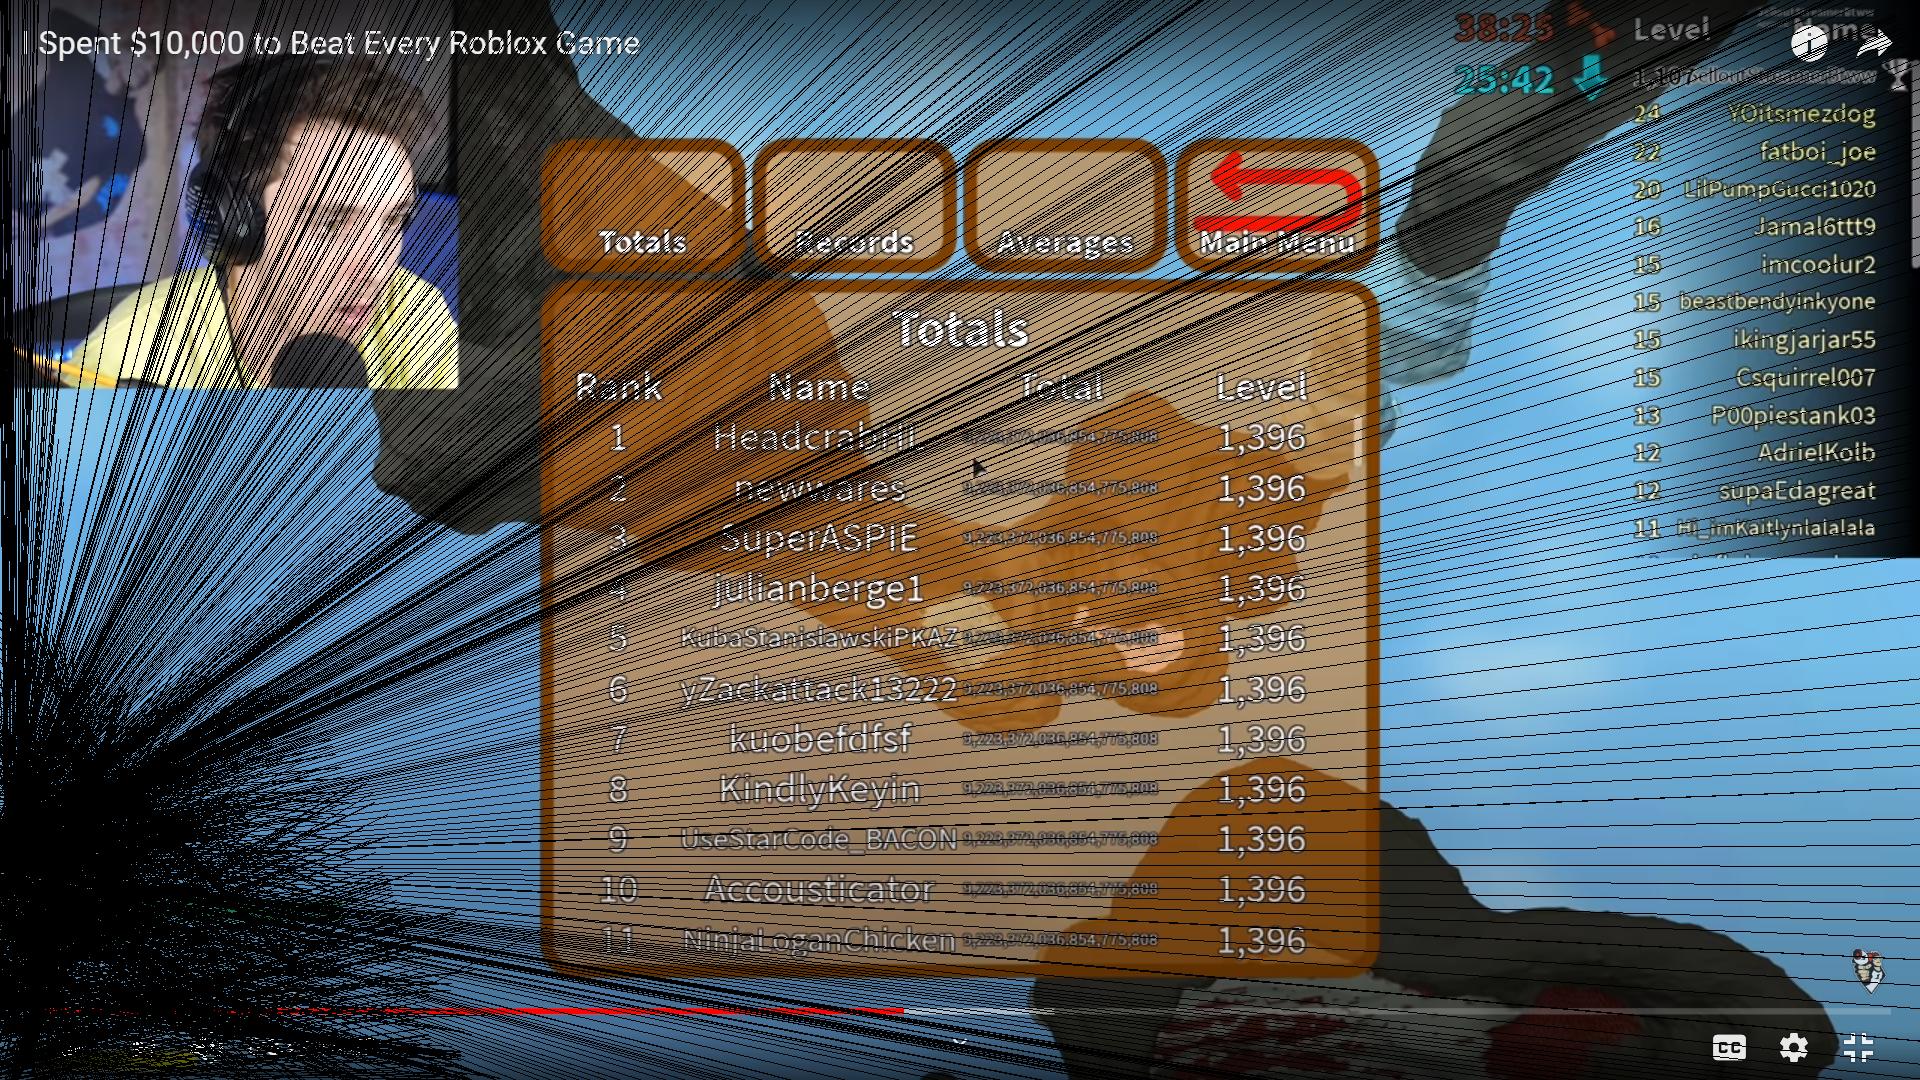 LAZERBEAM PLAYS ROBLOX (sry the cam is broken)